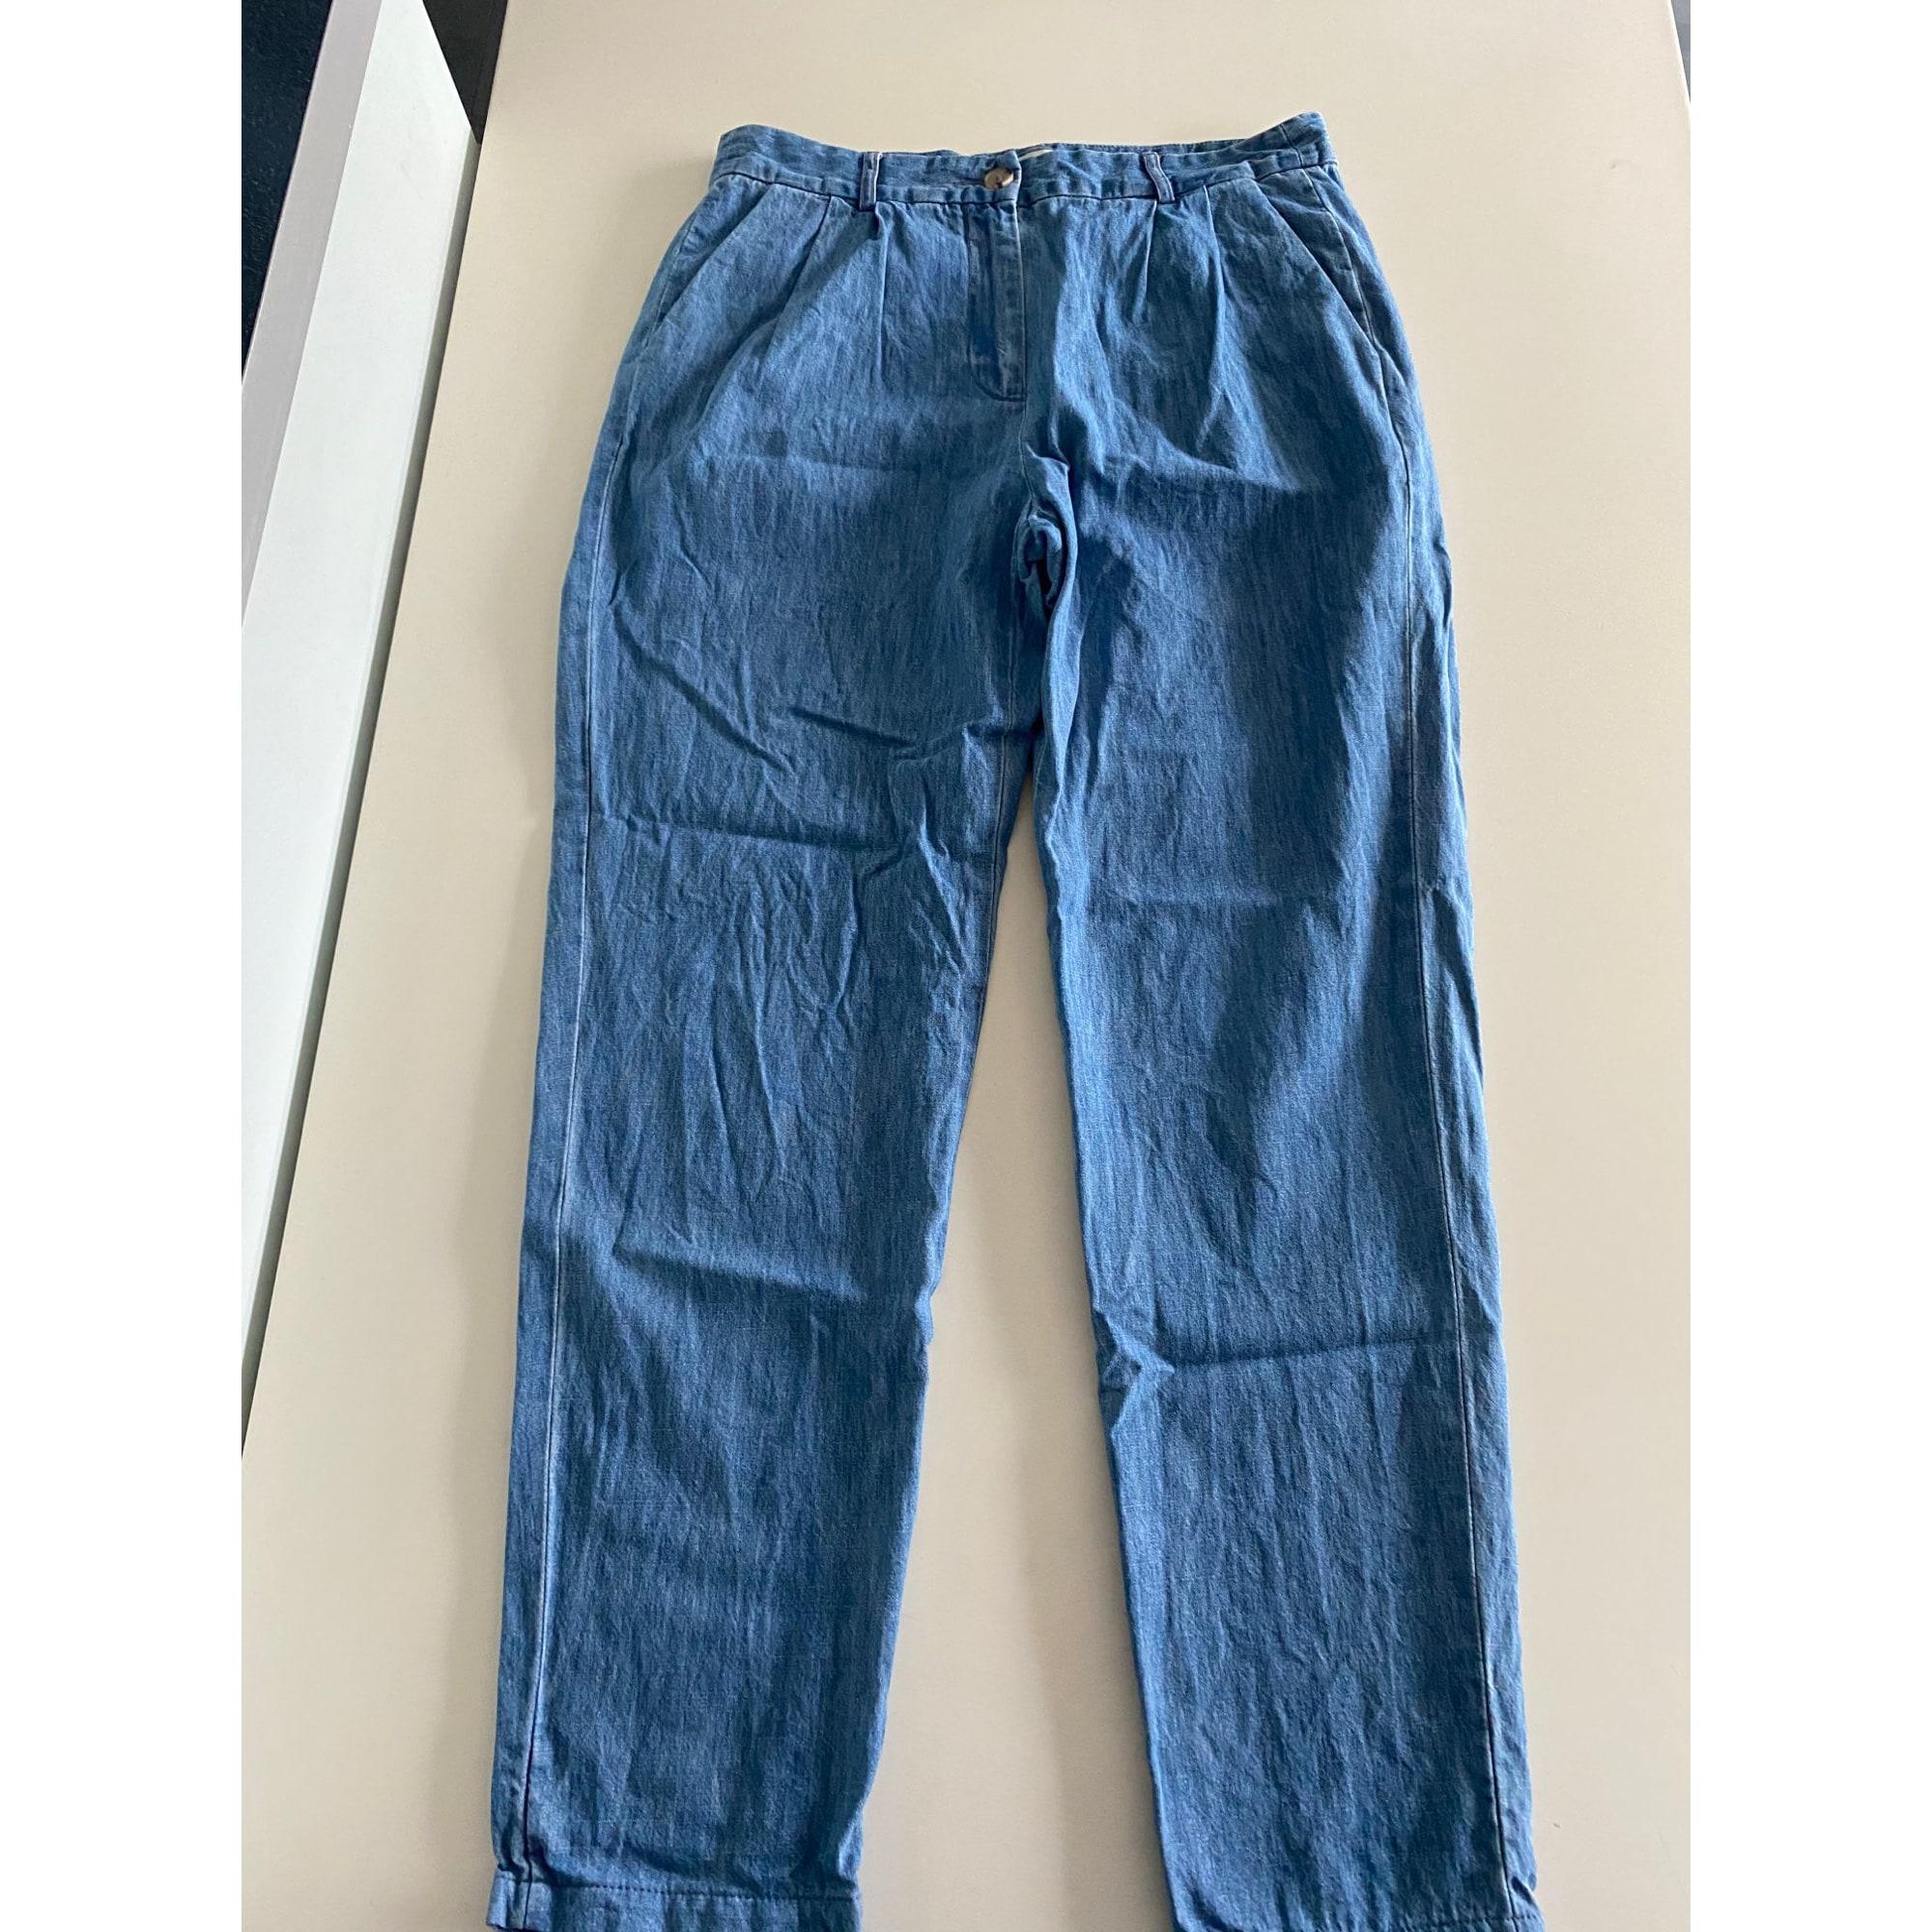 Pantalon droit PABLO PAR GÉRARD DAREL Bleu, bleu marine, bleu turquoise